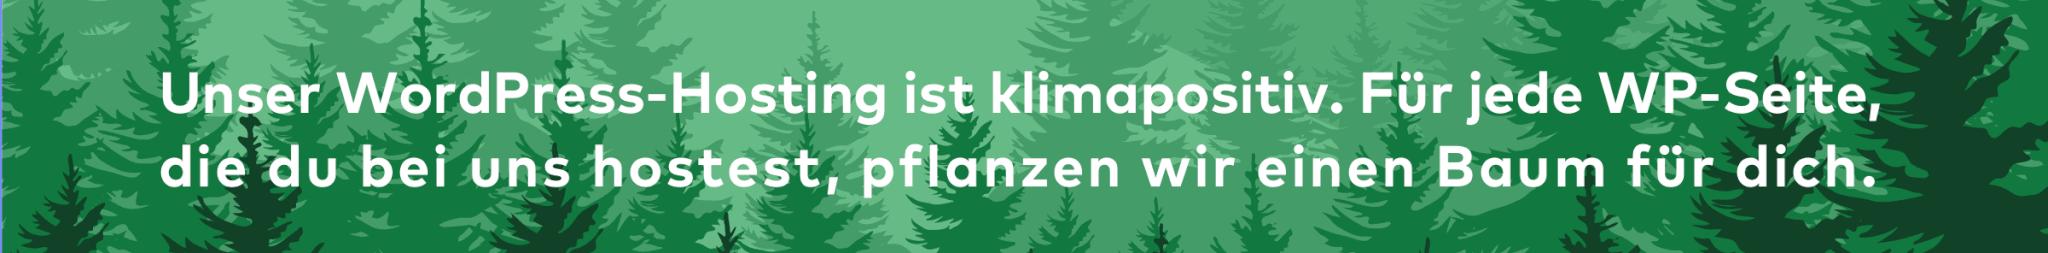 Klimapositives WordPress Hosting